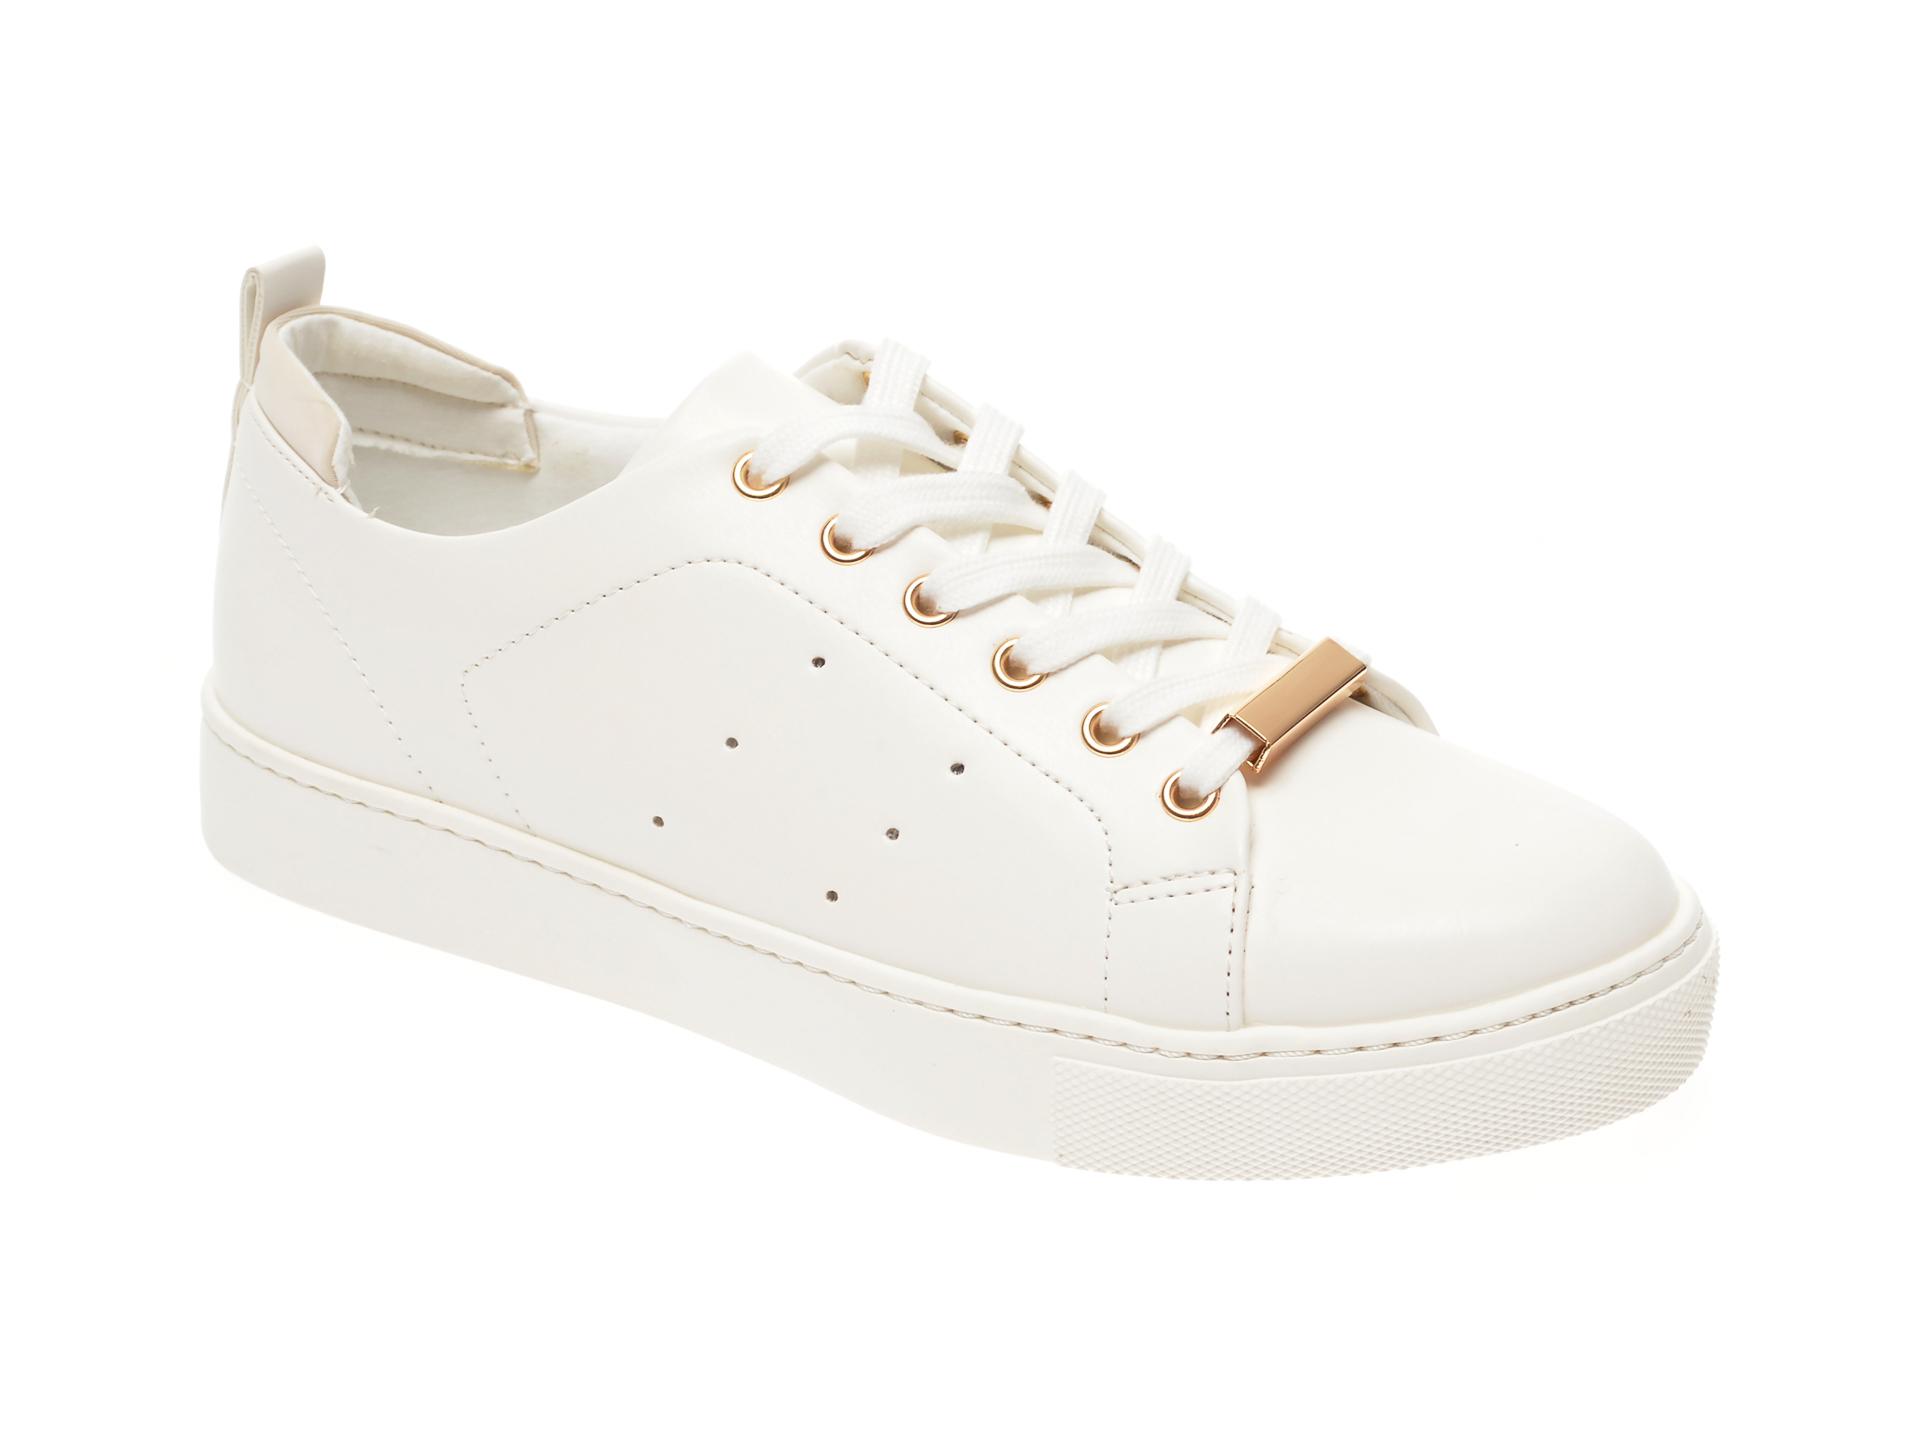 Pantofi sport ALDO albi, Mirarevia100, din piele ecologica